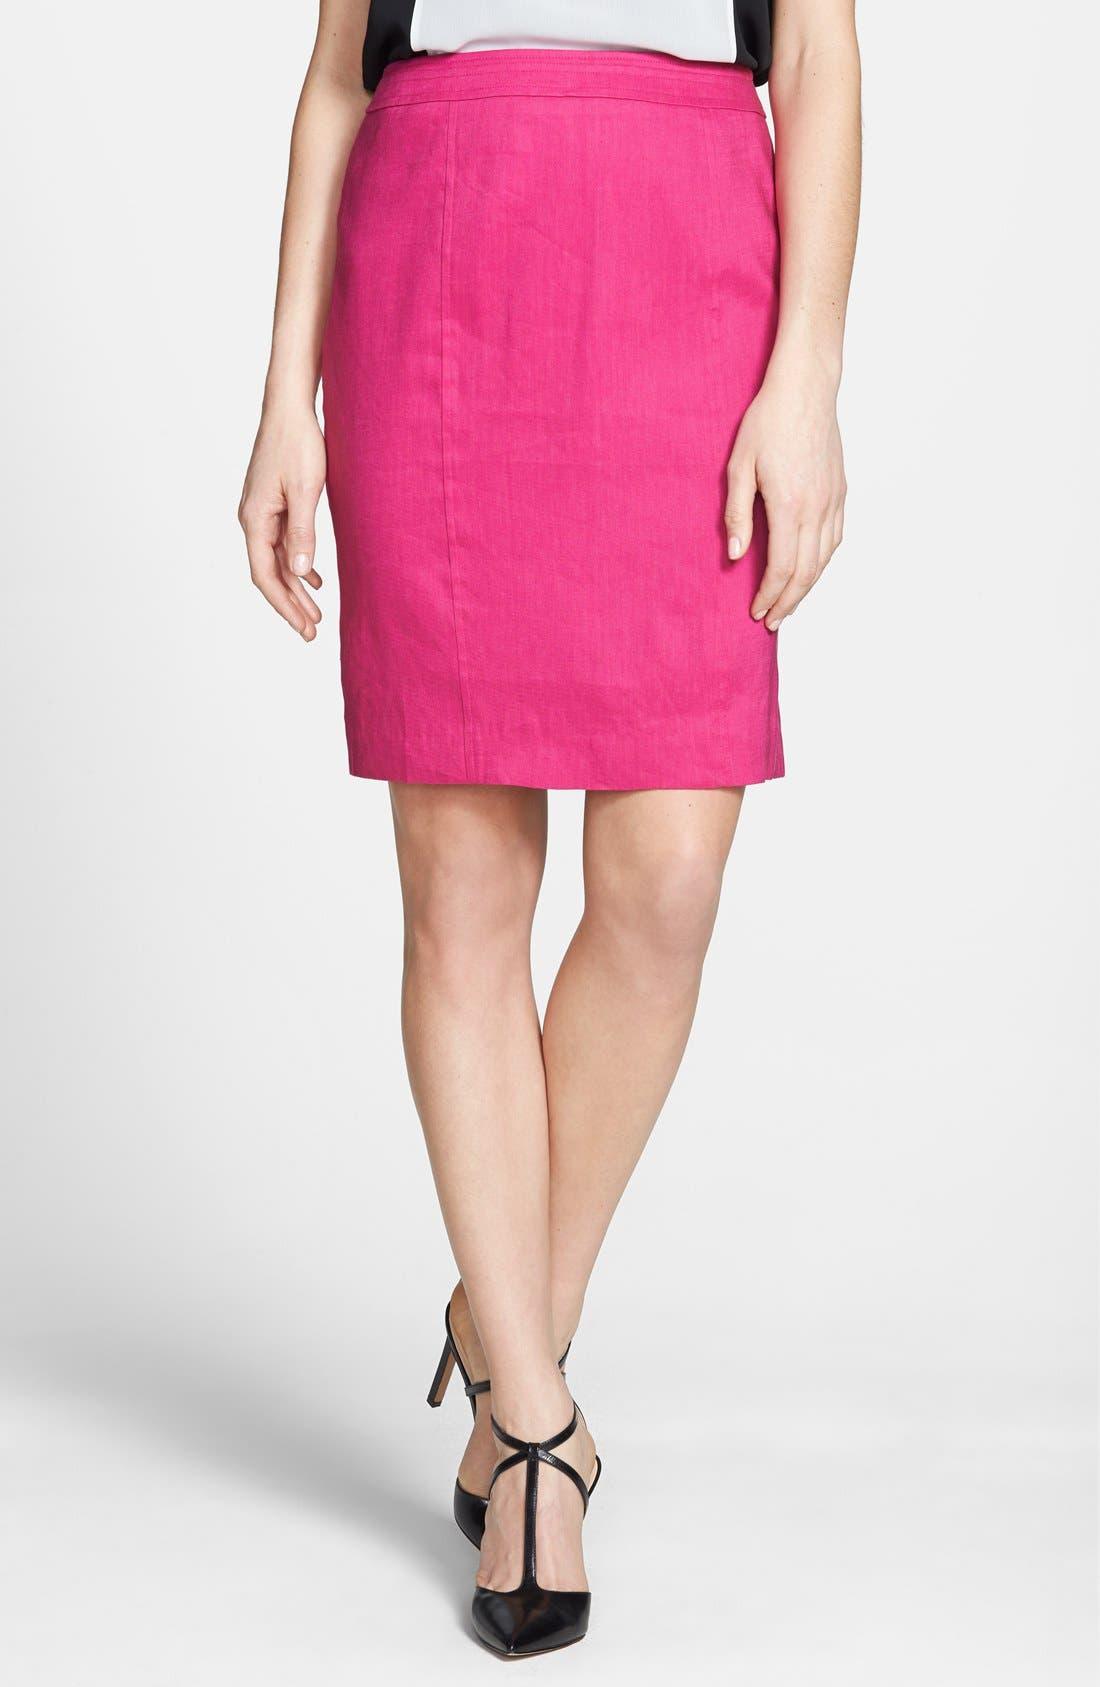 Alternate Image 1 Selected - Halogen® Linen Blend Pencil Skirt (Regular & Petite)